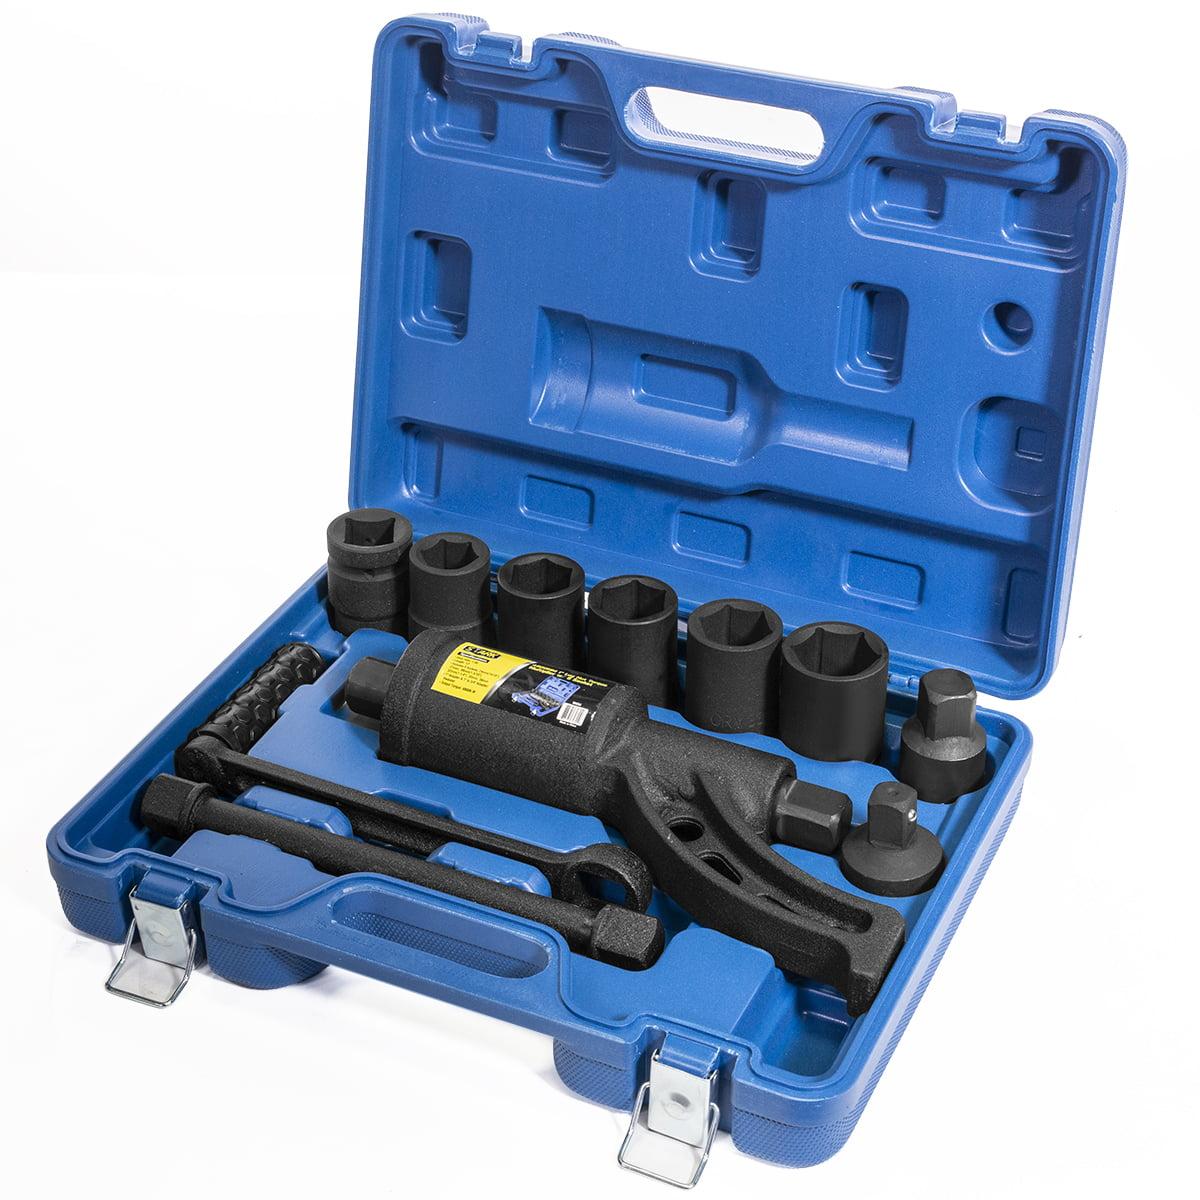 Semi truck lug wrench pergola canopy kit